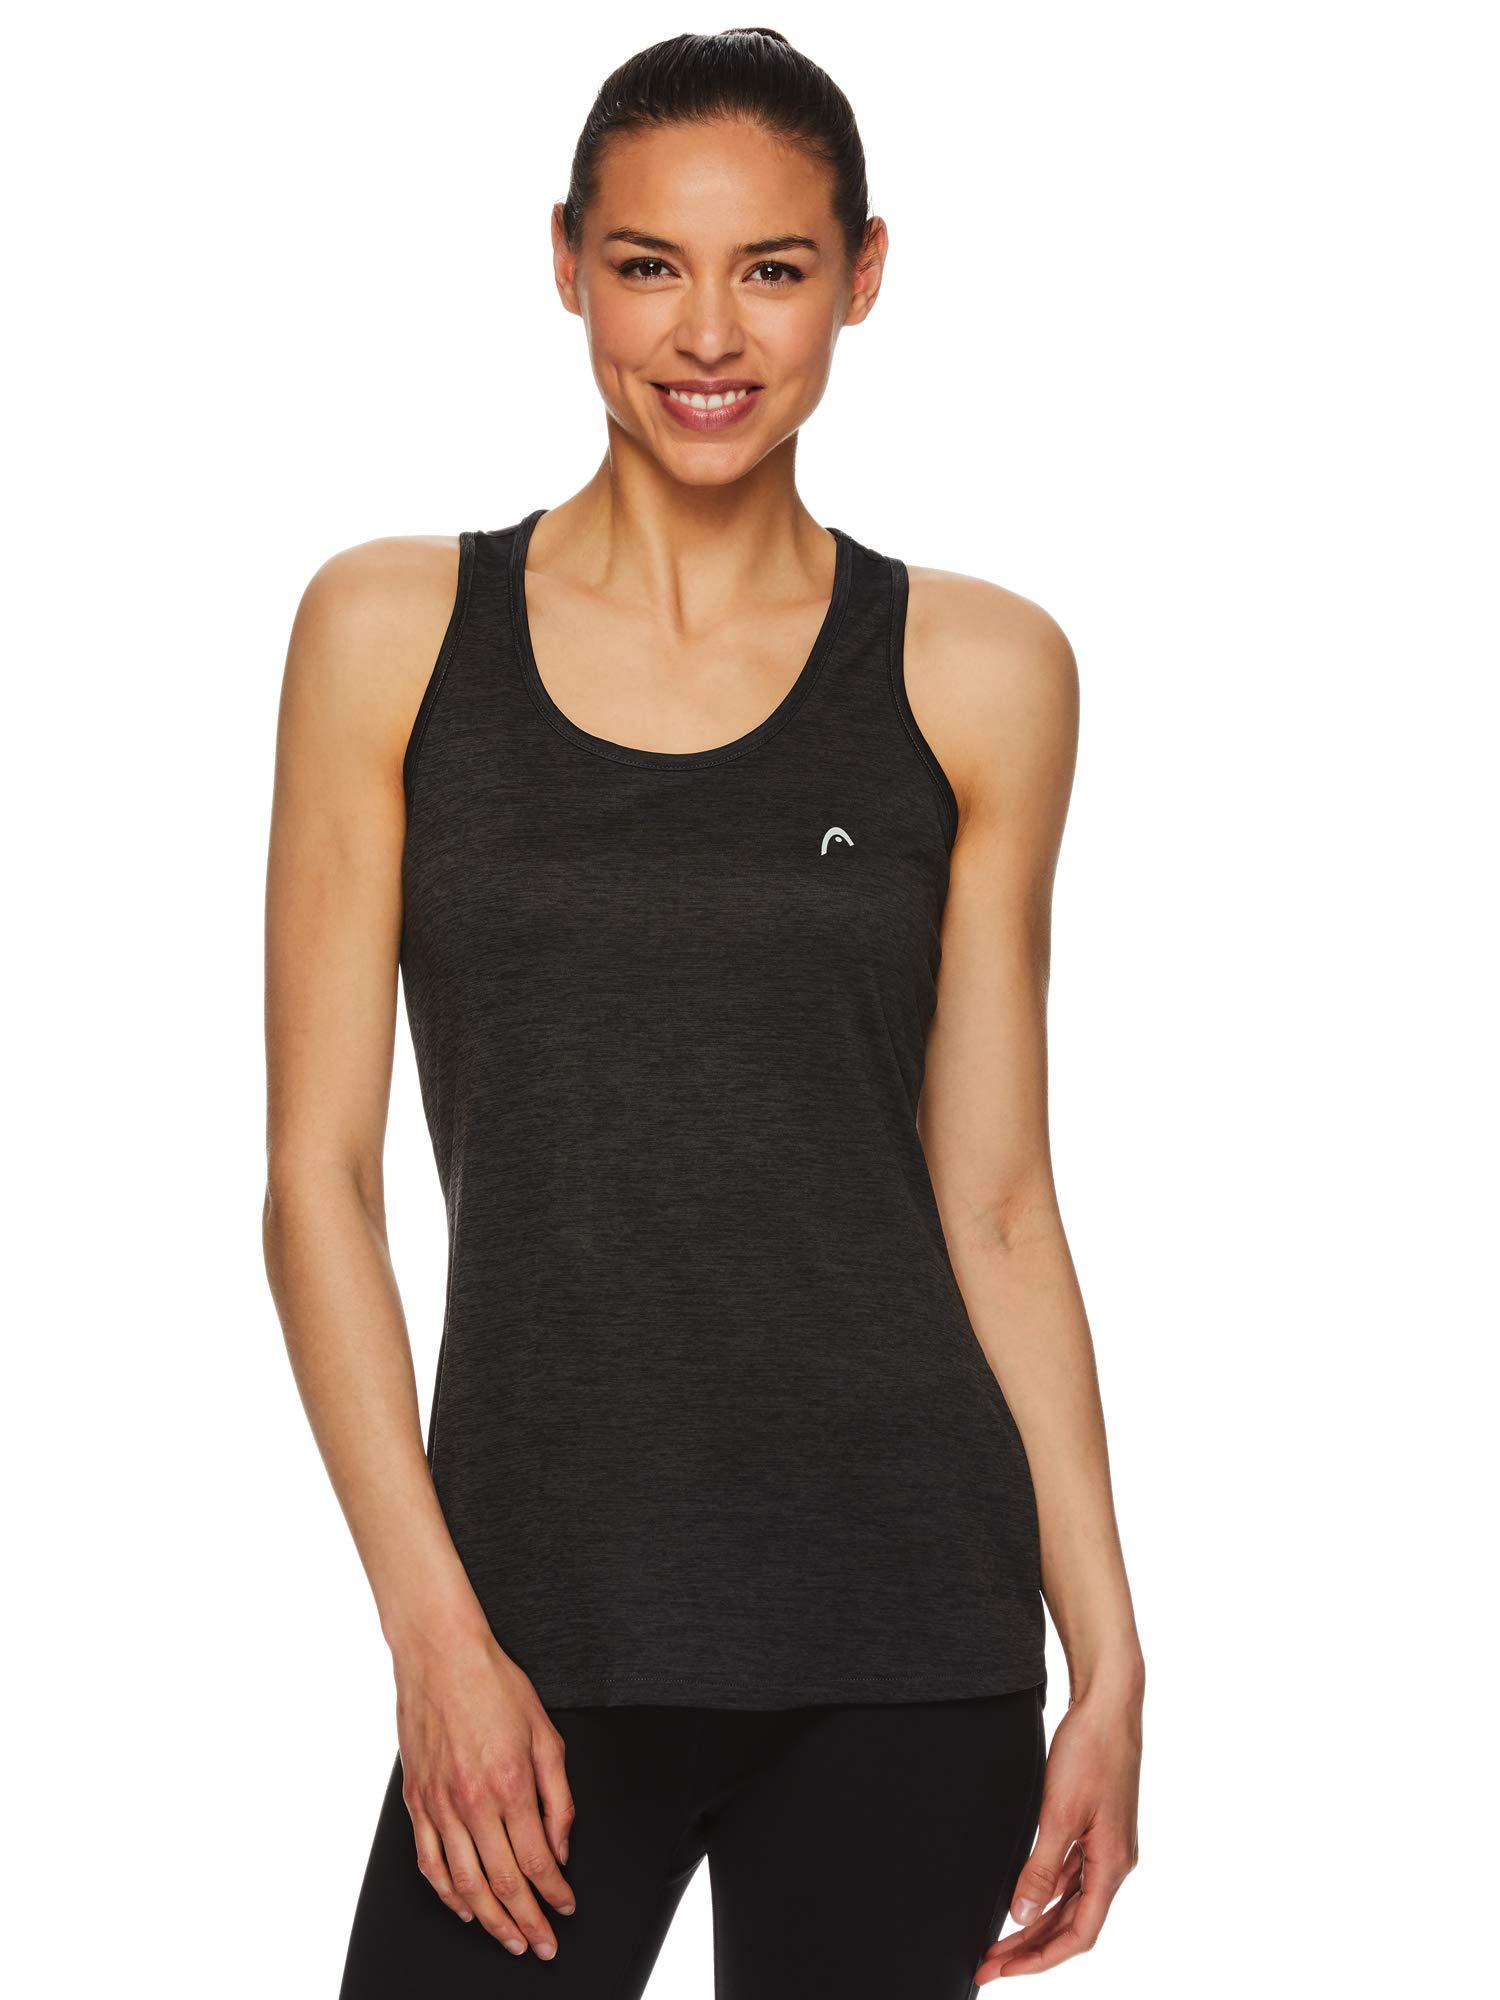 HEAD Women's Racerback Tank Top - Sleeveless Flowy Performance Activewear Shirt - Rally Black Heather, X-Small